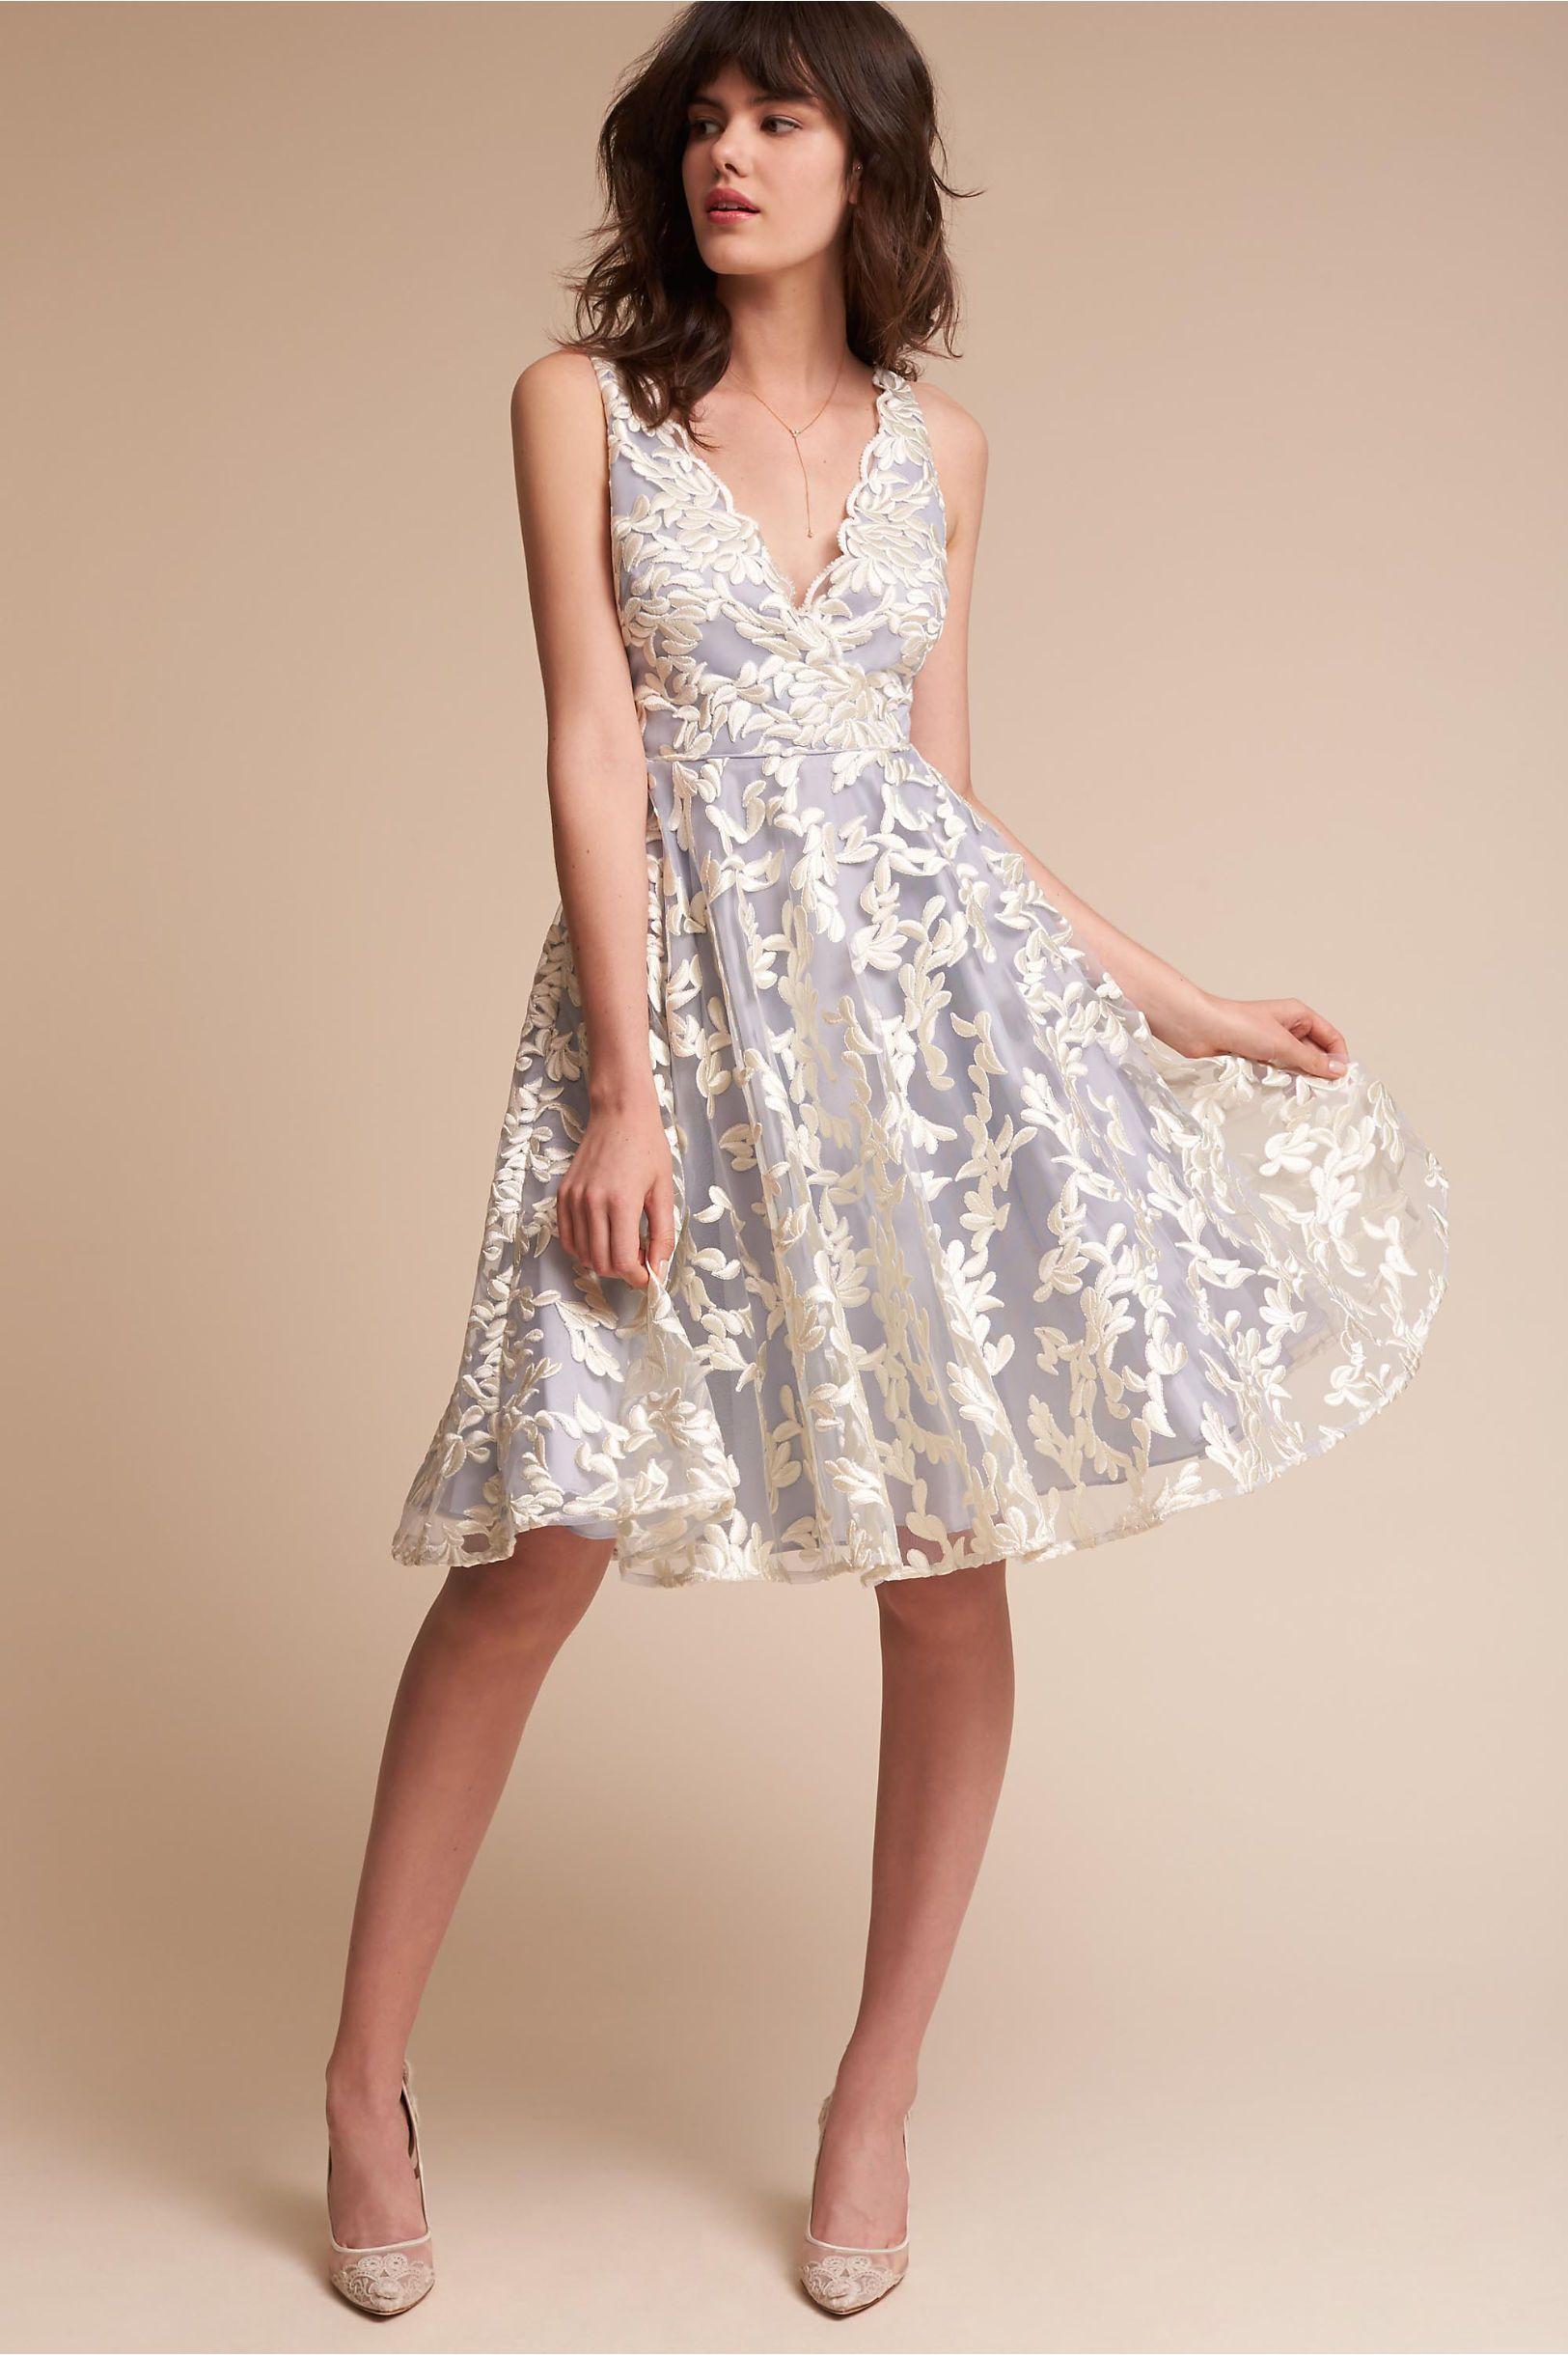 8ffee2663f6b BHLDN Abbey Dress in Bride Little White Dresses